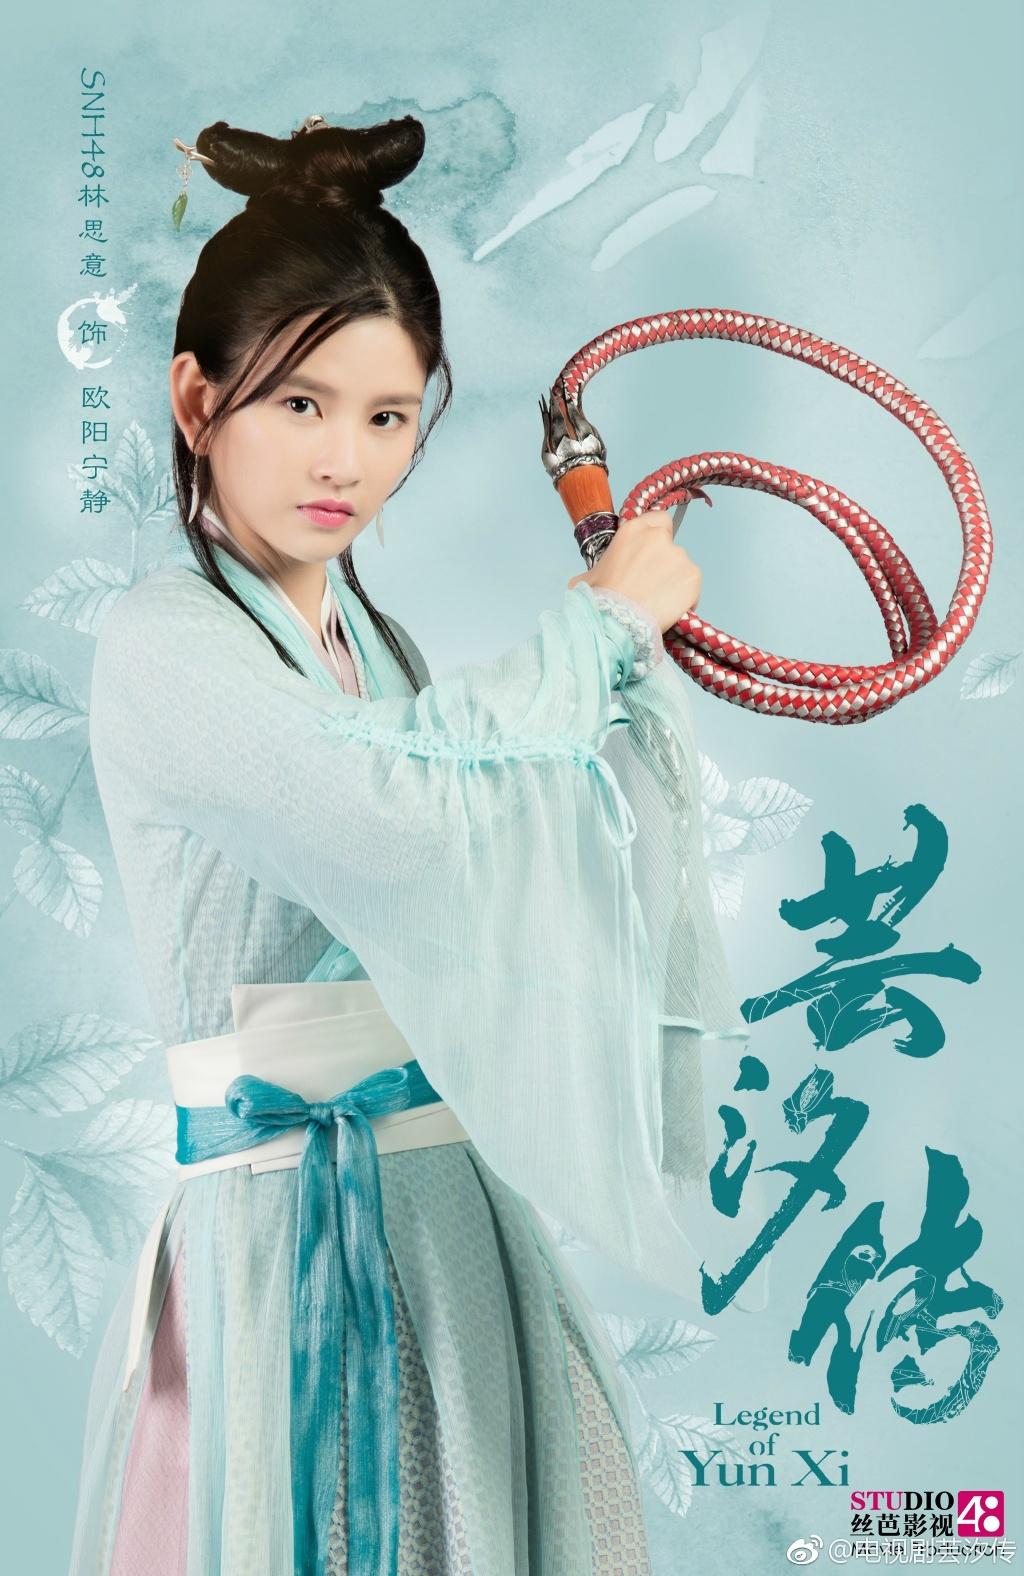 Character introductions: Legend of Yun Xi - DramaPanda